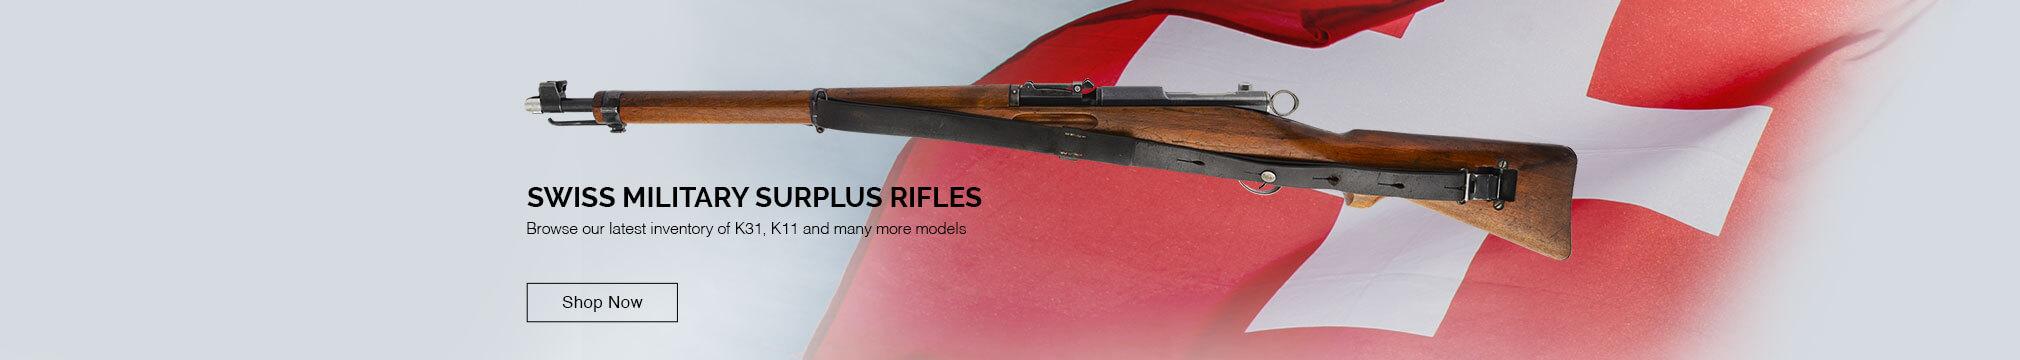 Swiss military rifles